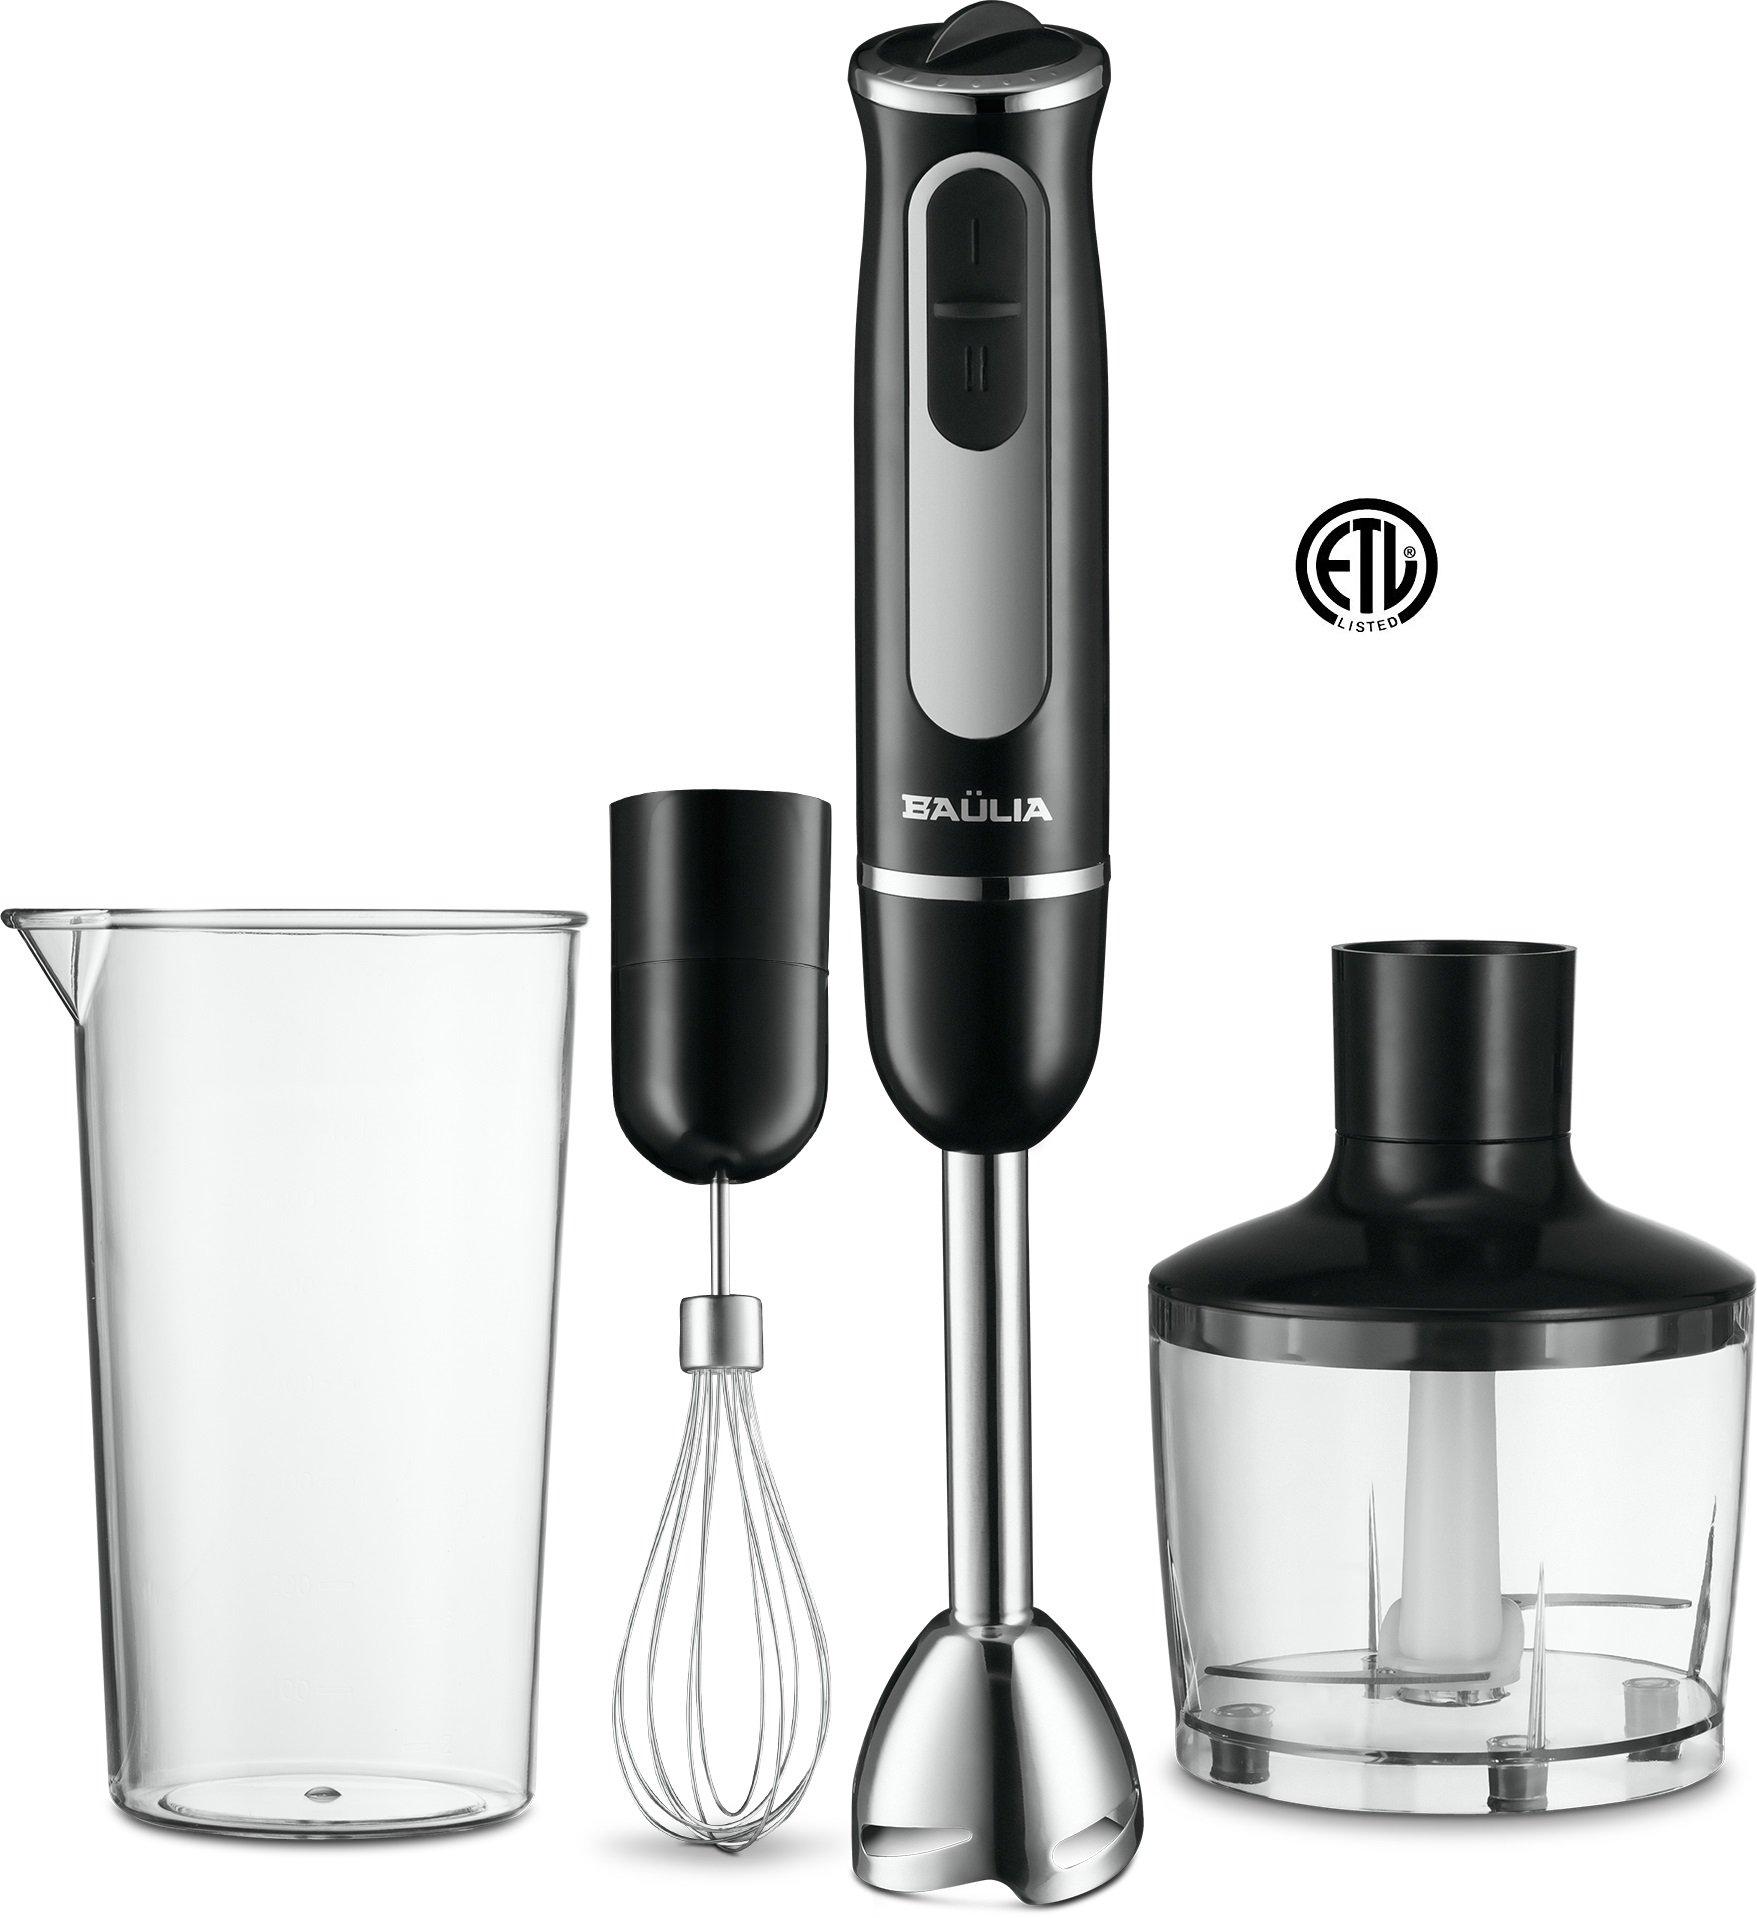 Baulia HB802 500 Watt All-in-One Immersion Powerful Hand Blender Set, Black